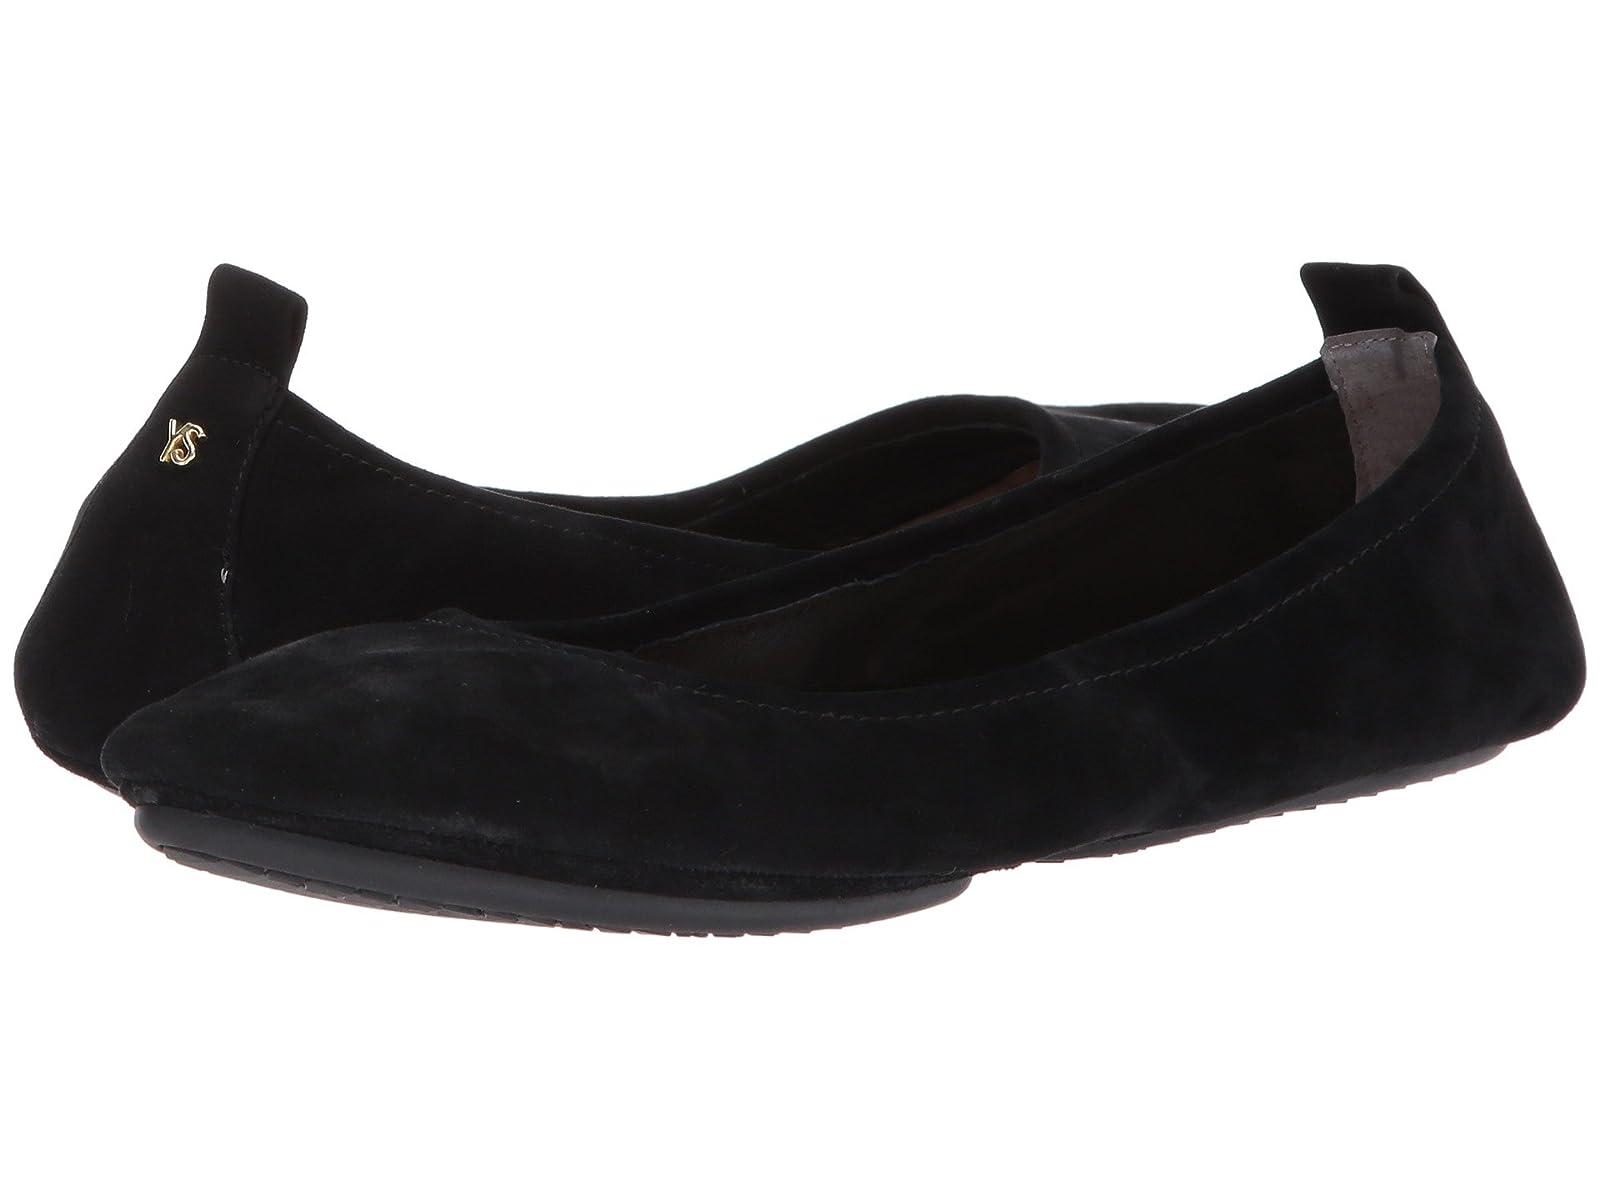 Yosi Samra Vienna 2 FlatAtmospheric grades have affordable shoes